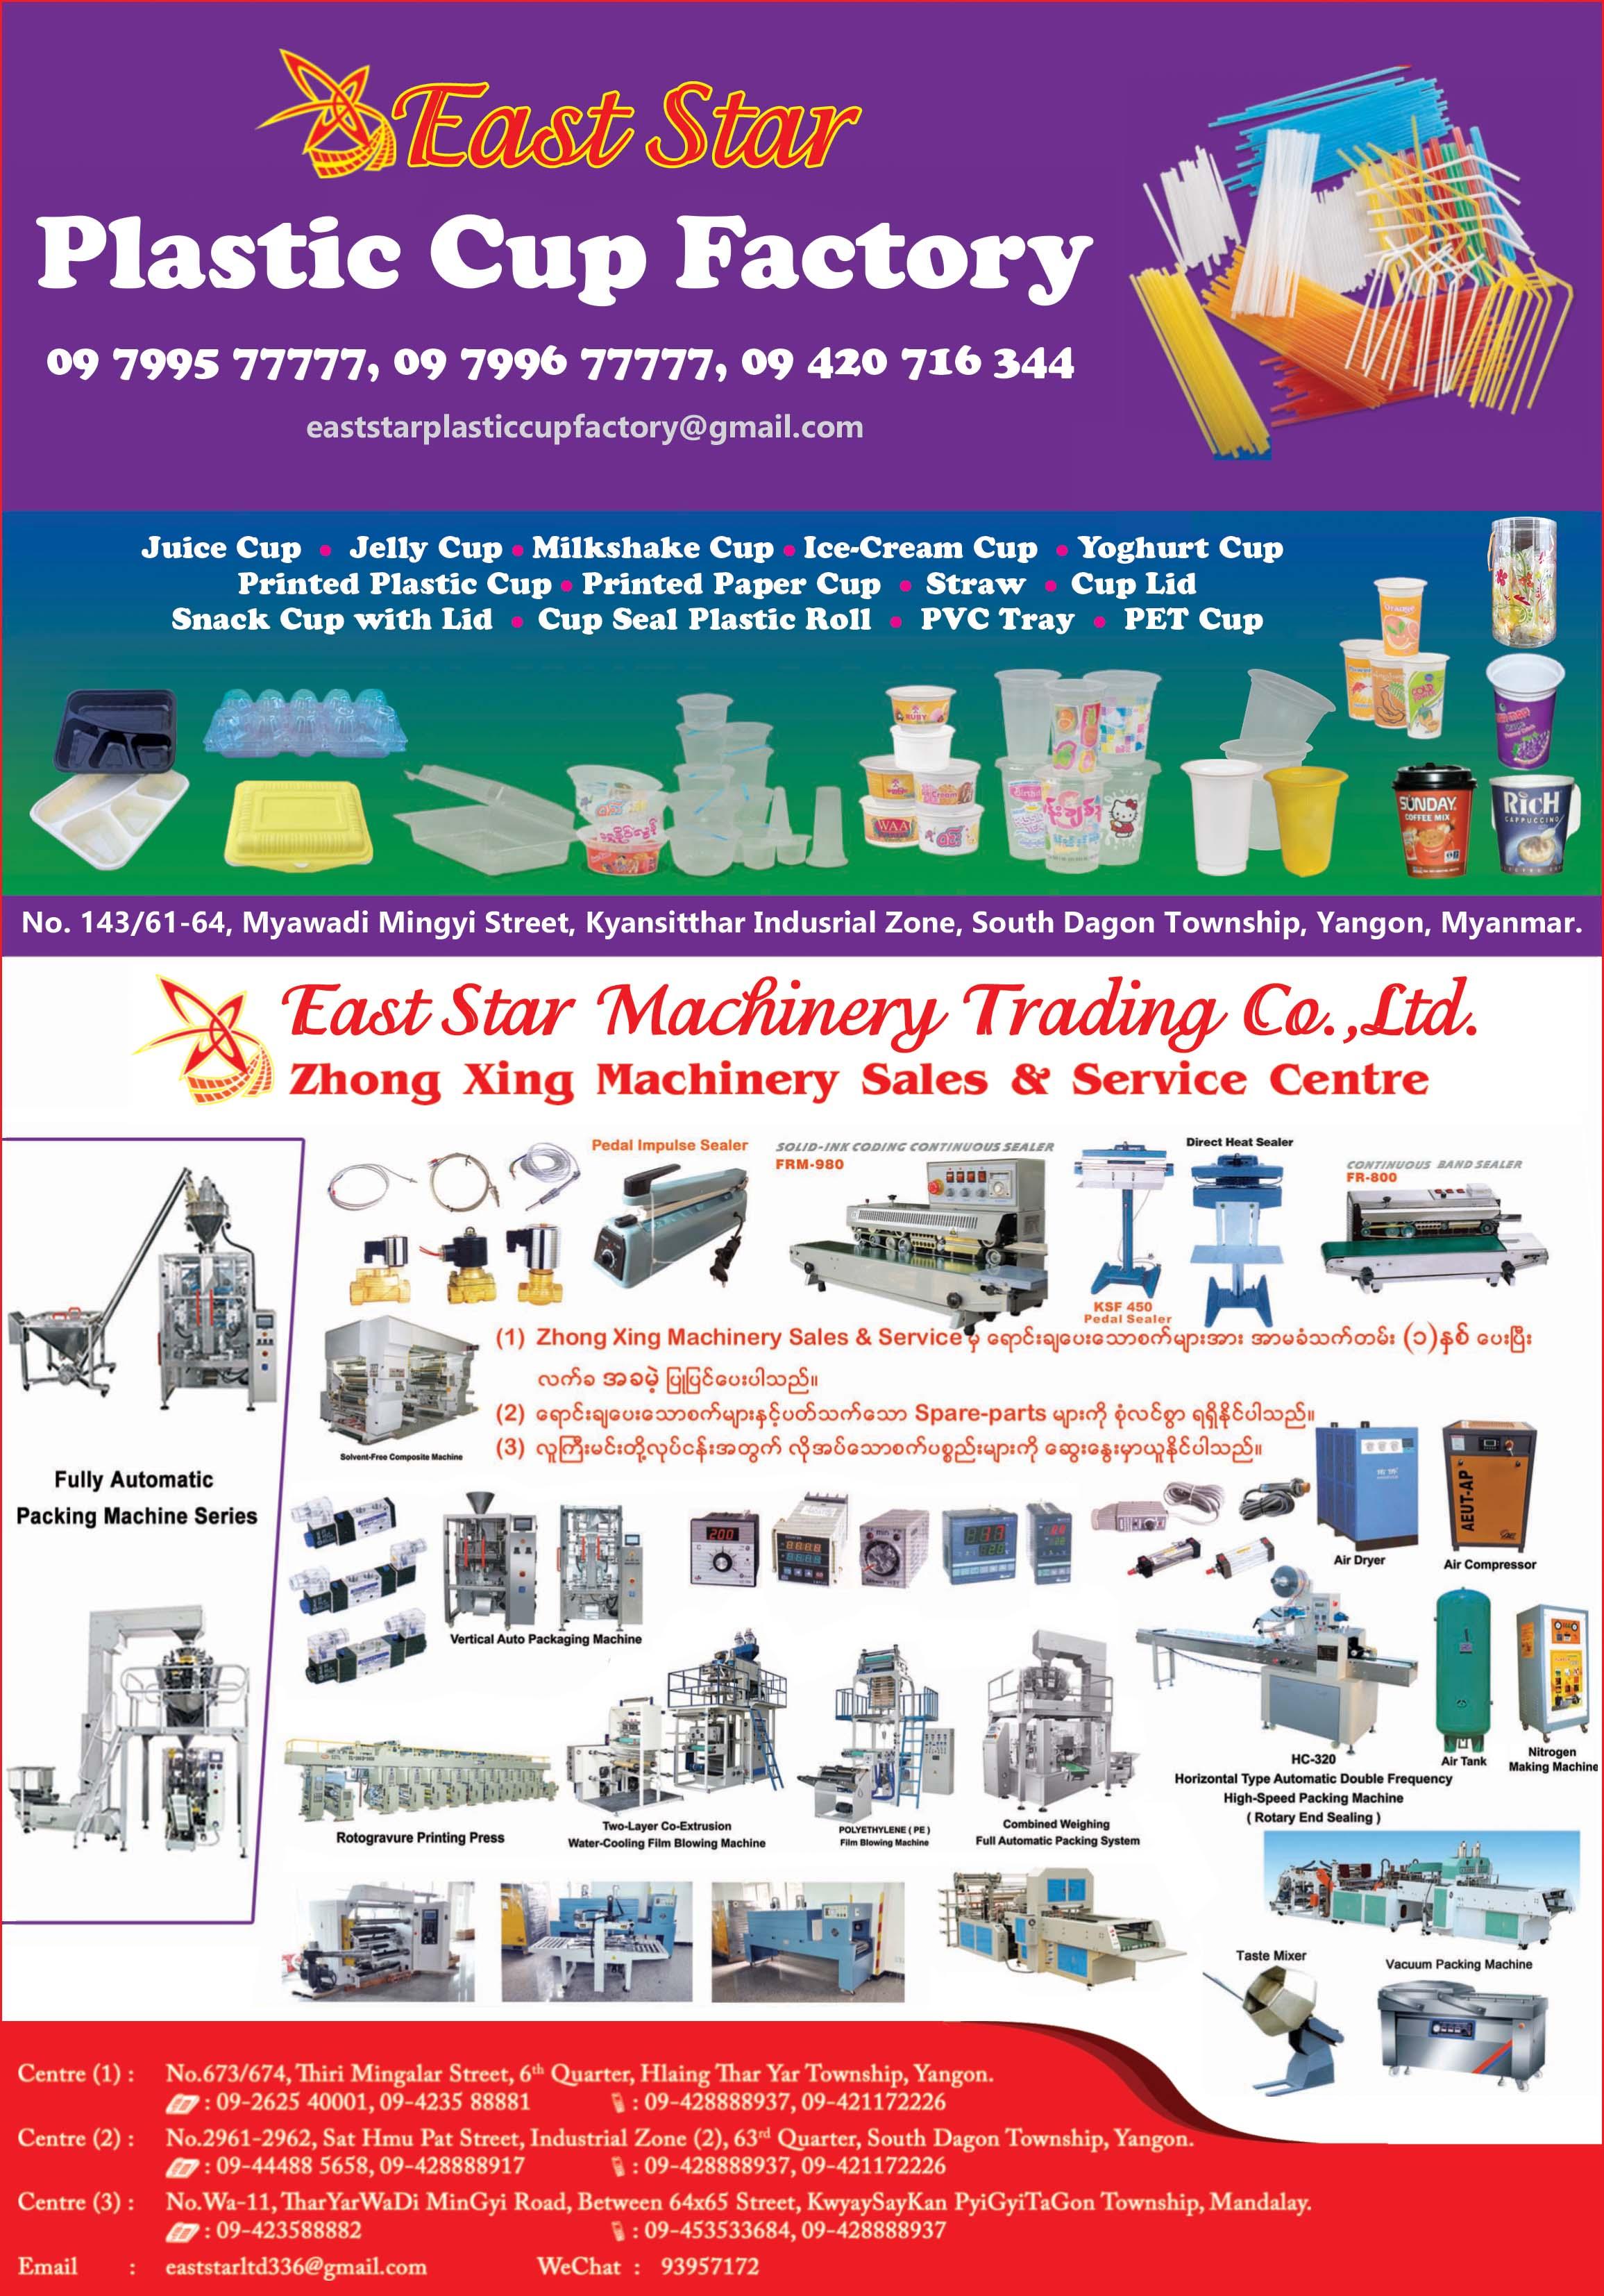 East Star Machinery Trading Co., Ltd. (Zhong Xing)